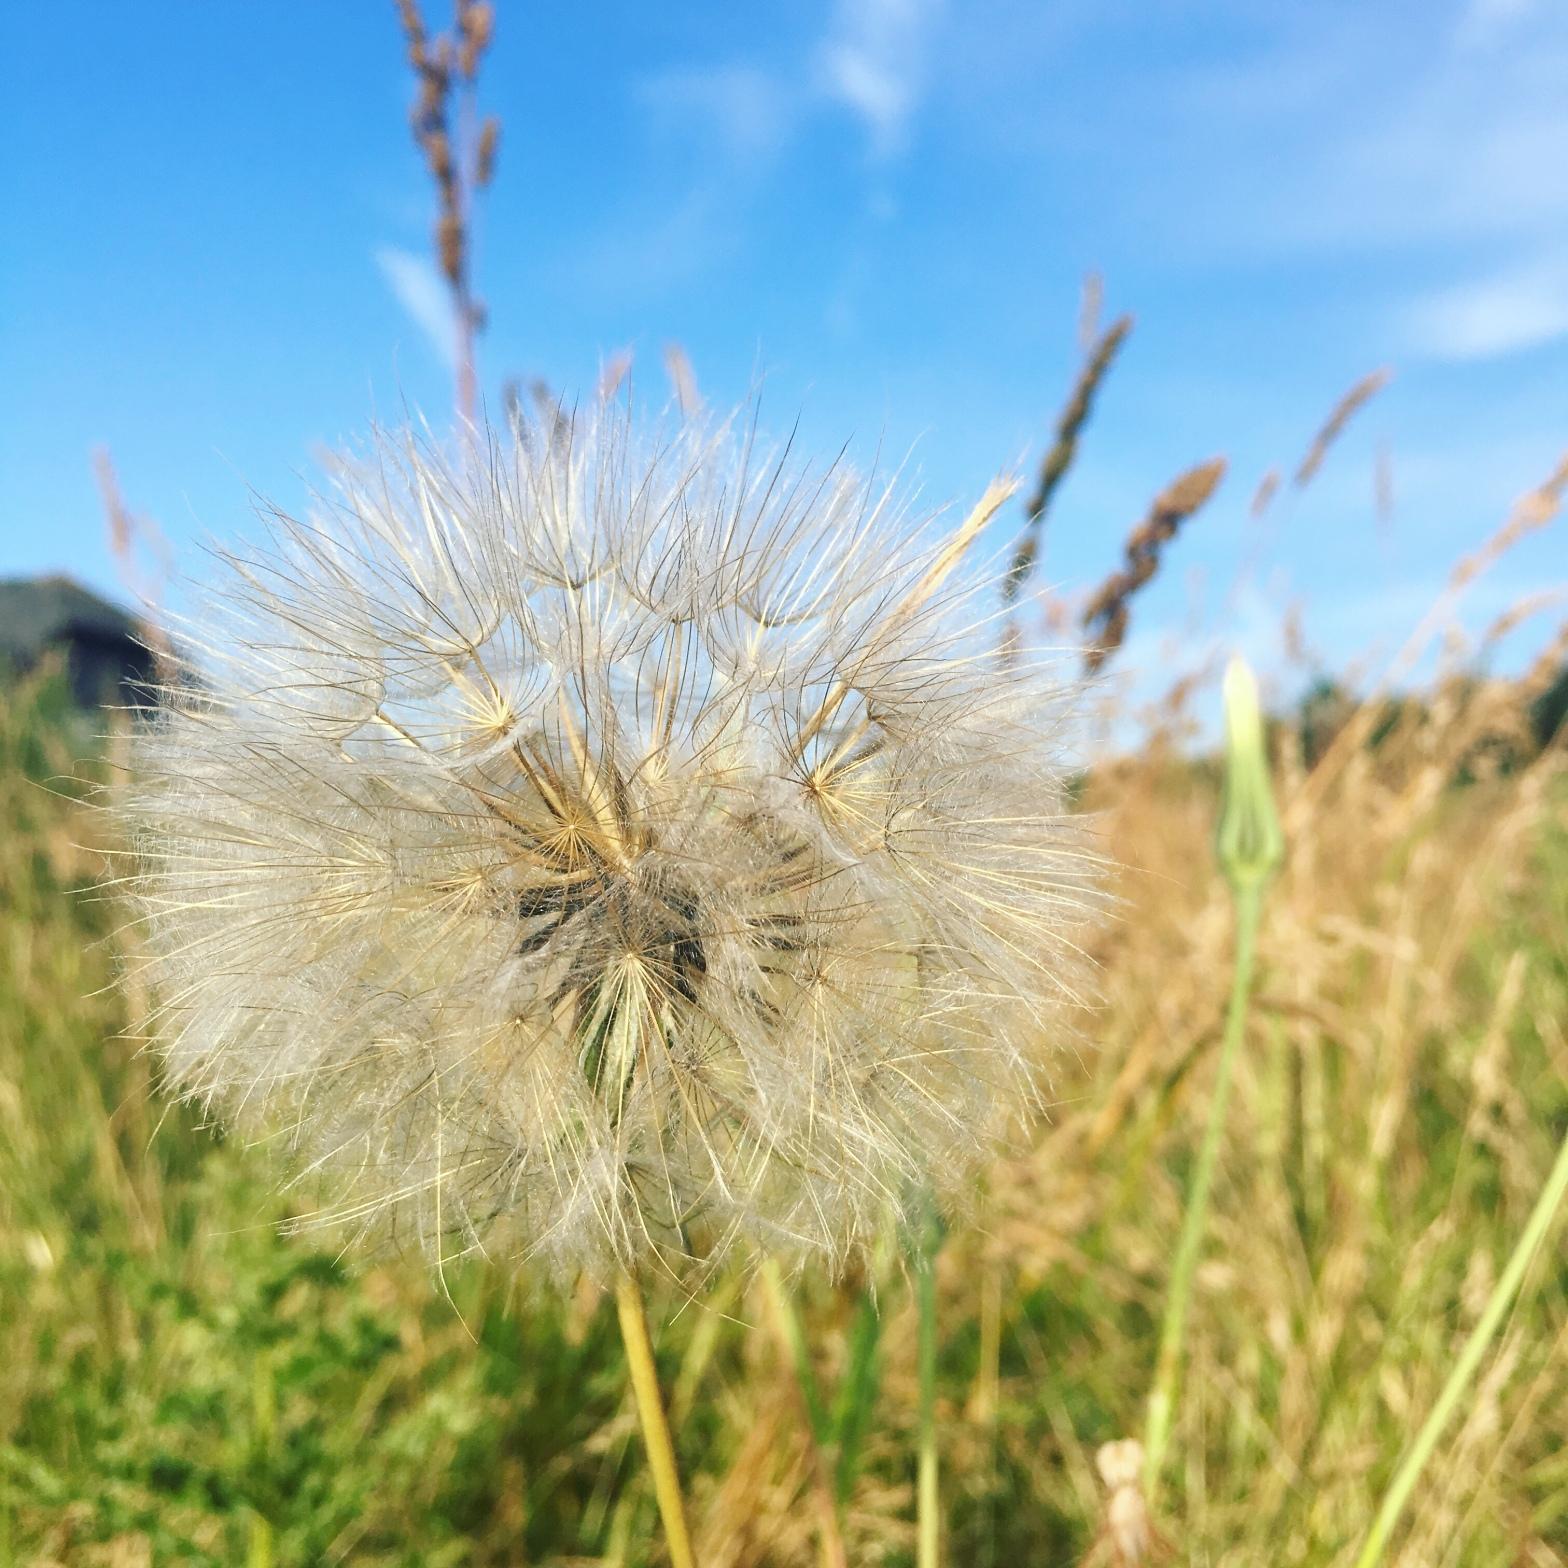 Close up of a Dandelion in a field